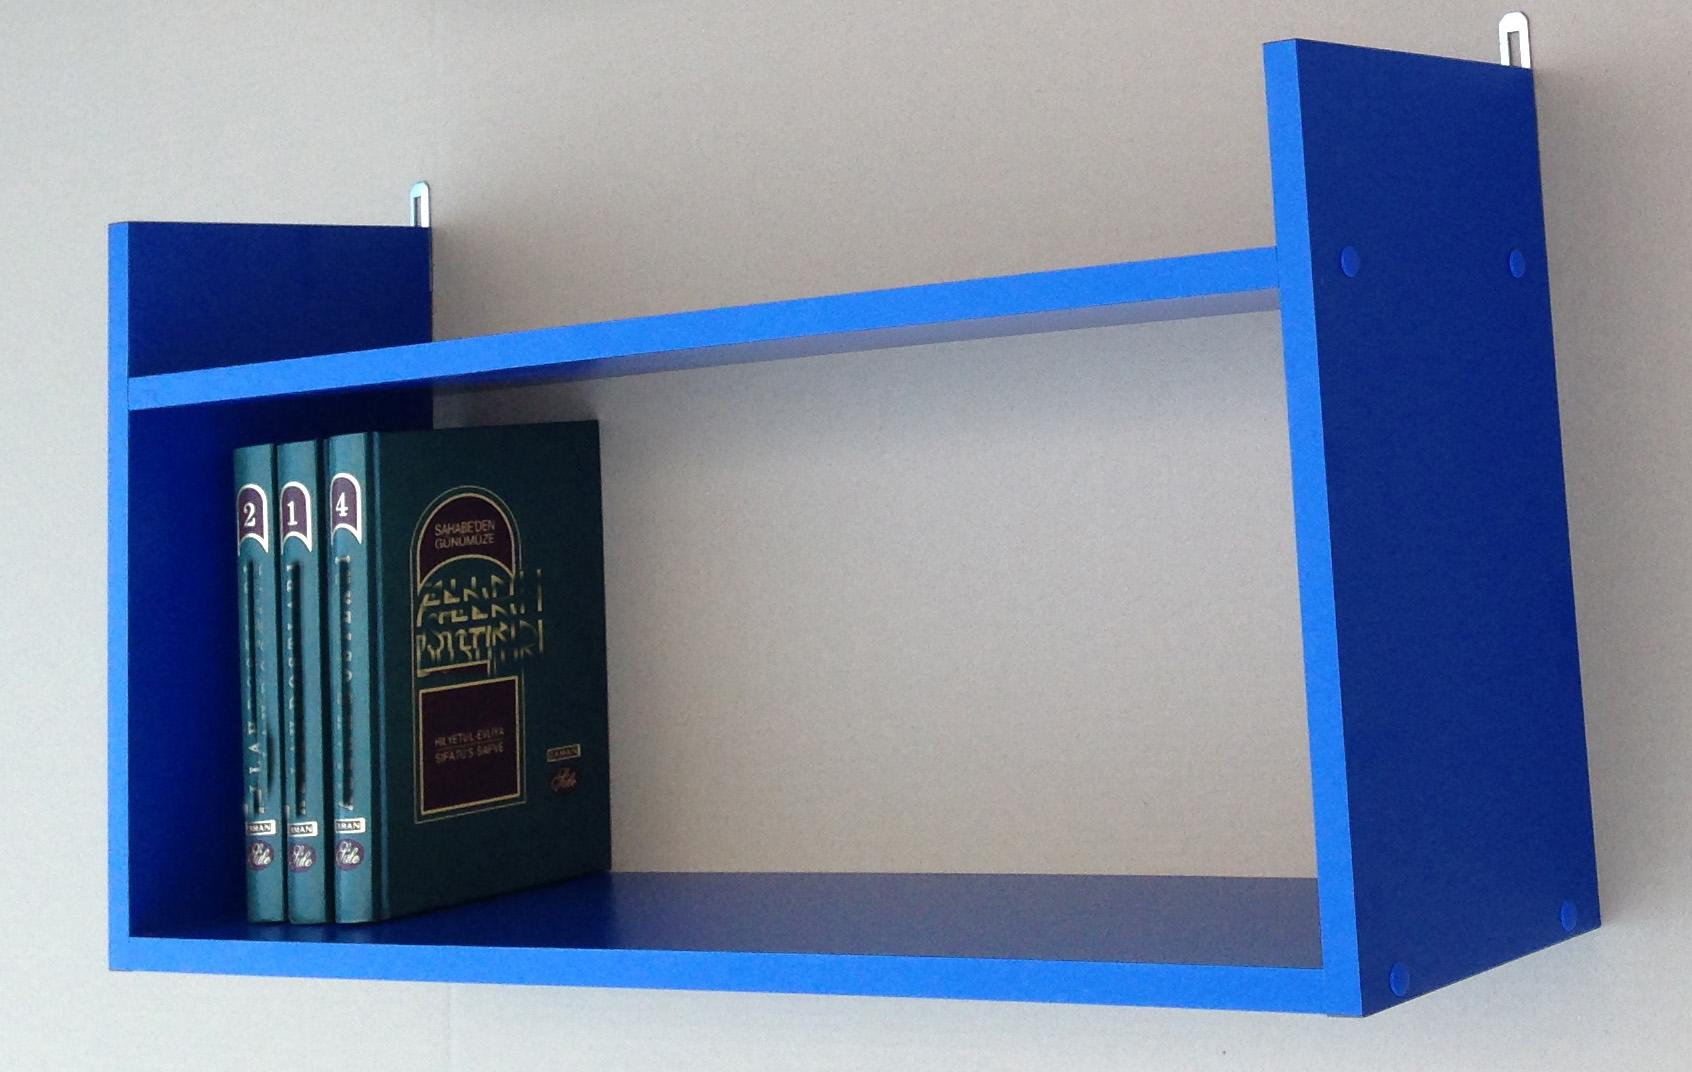 wandregal b cherregal kinderregal regal mod r463 blau ahorn nussbaum ebay. Black Bedroom Furniture Sets. Home Design Ideas